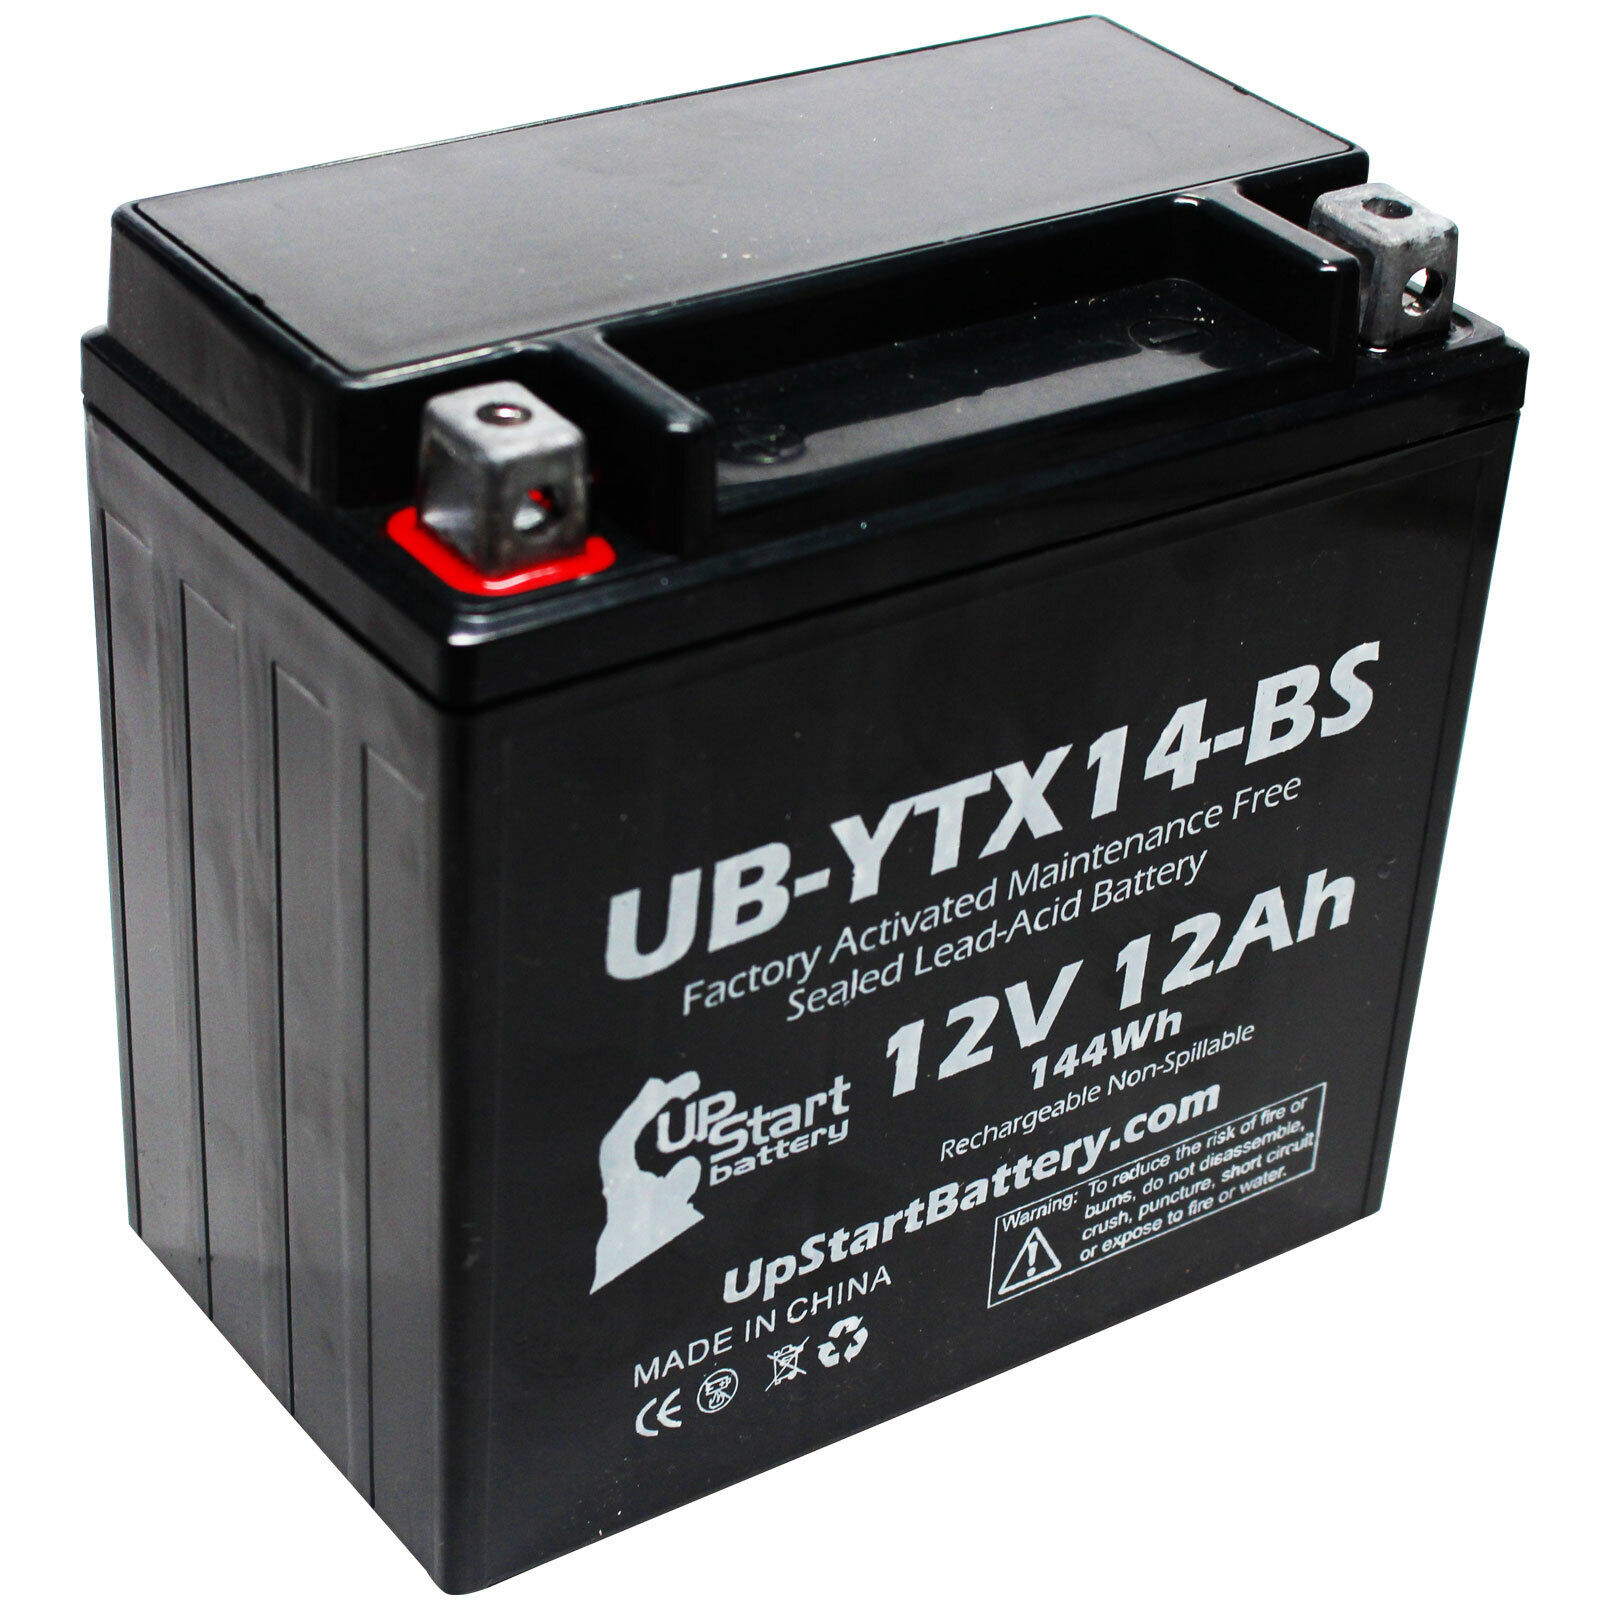 12V 12AH Battery for 2003 Honda TRX500FA Fourtrax Rubicon 450 CC